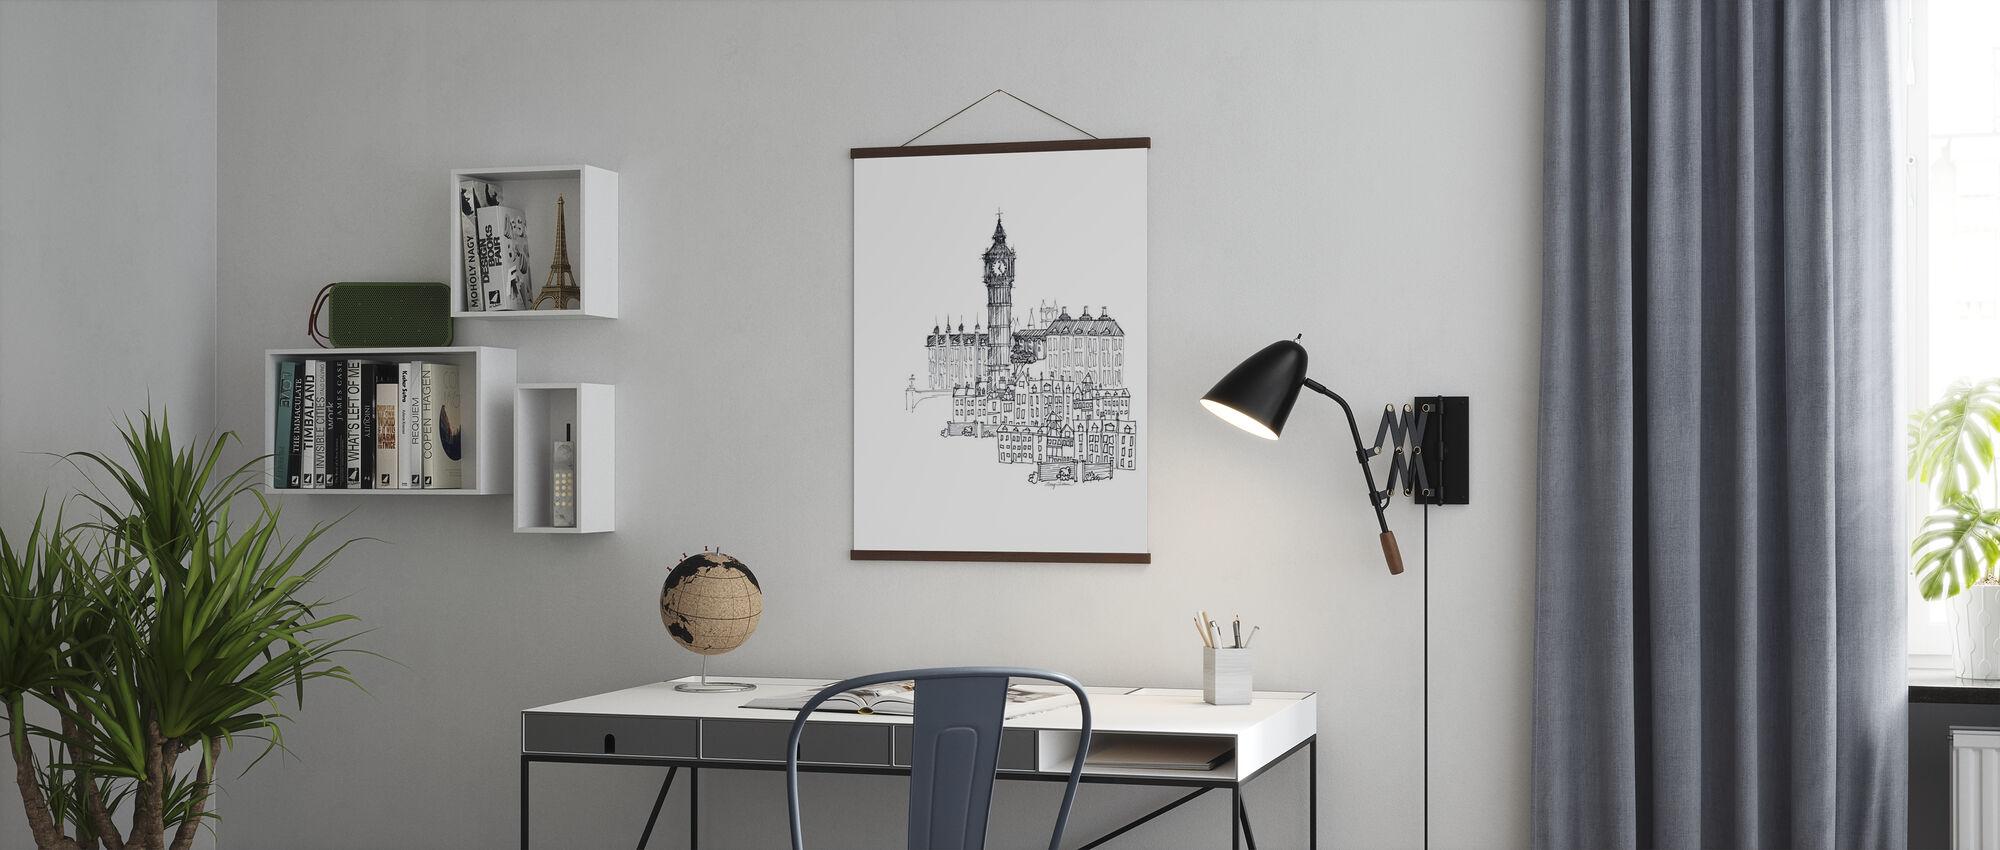 Avery Tillmon - Big Ben - Poster - Office